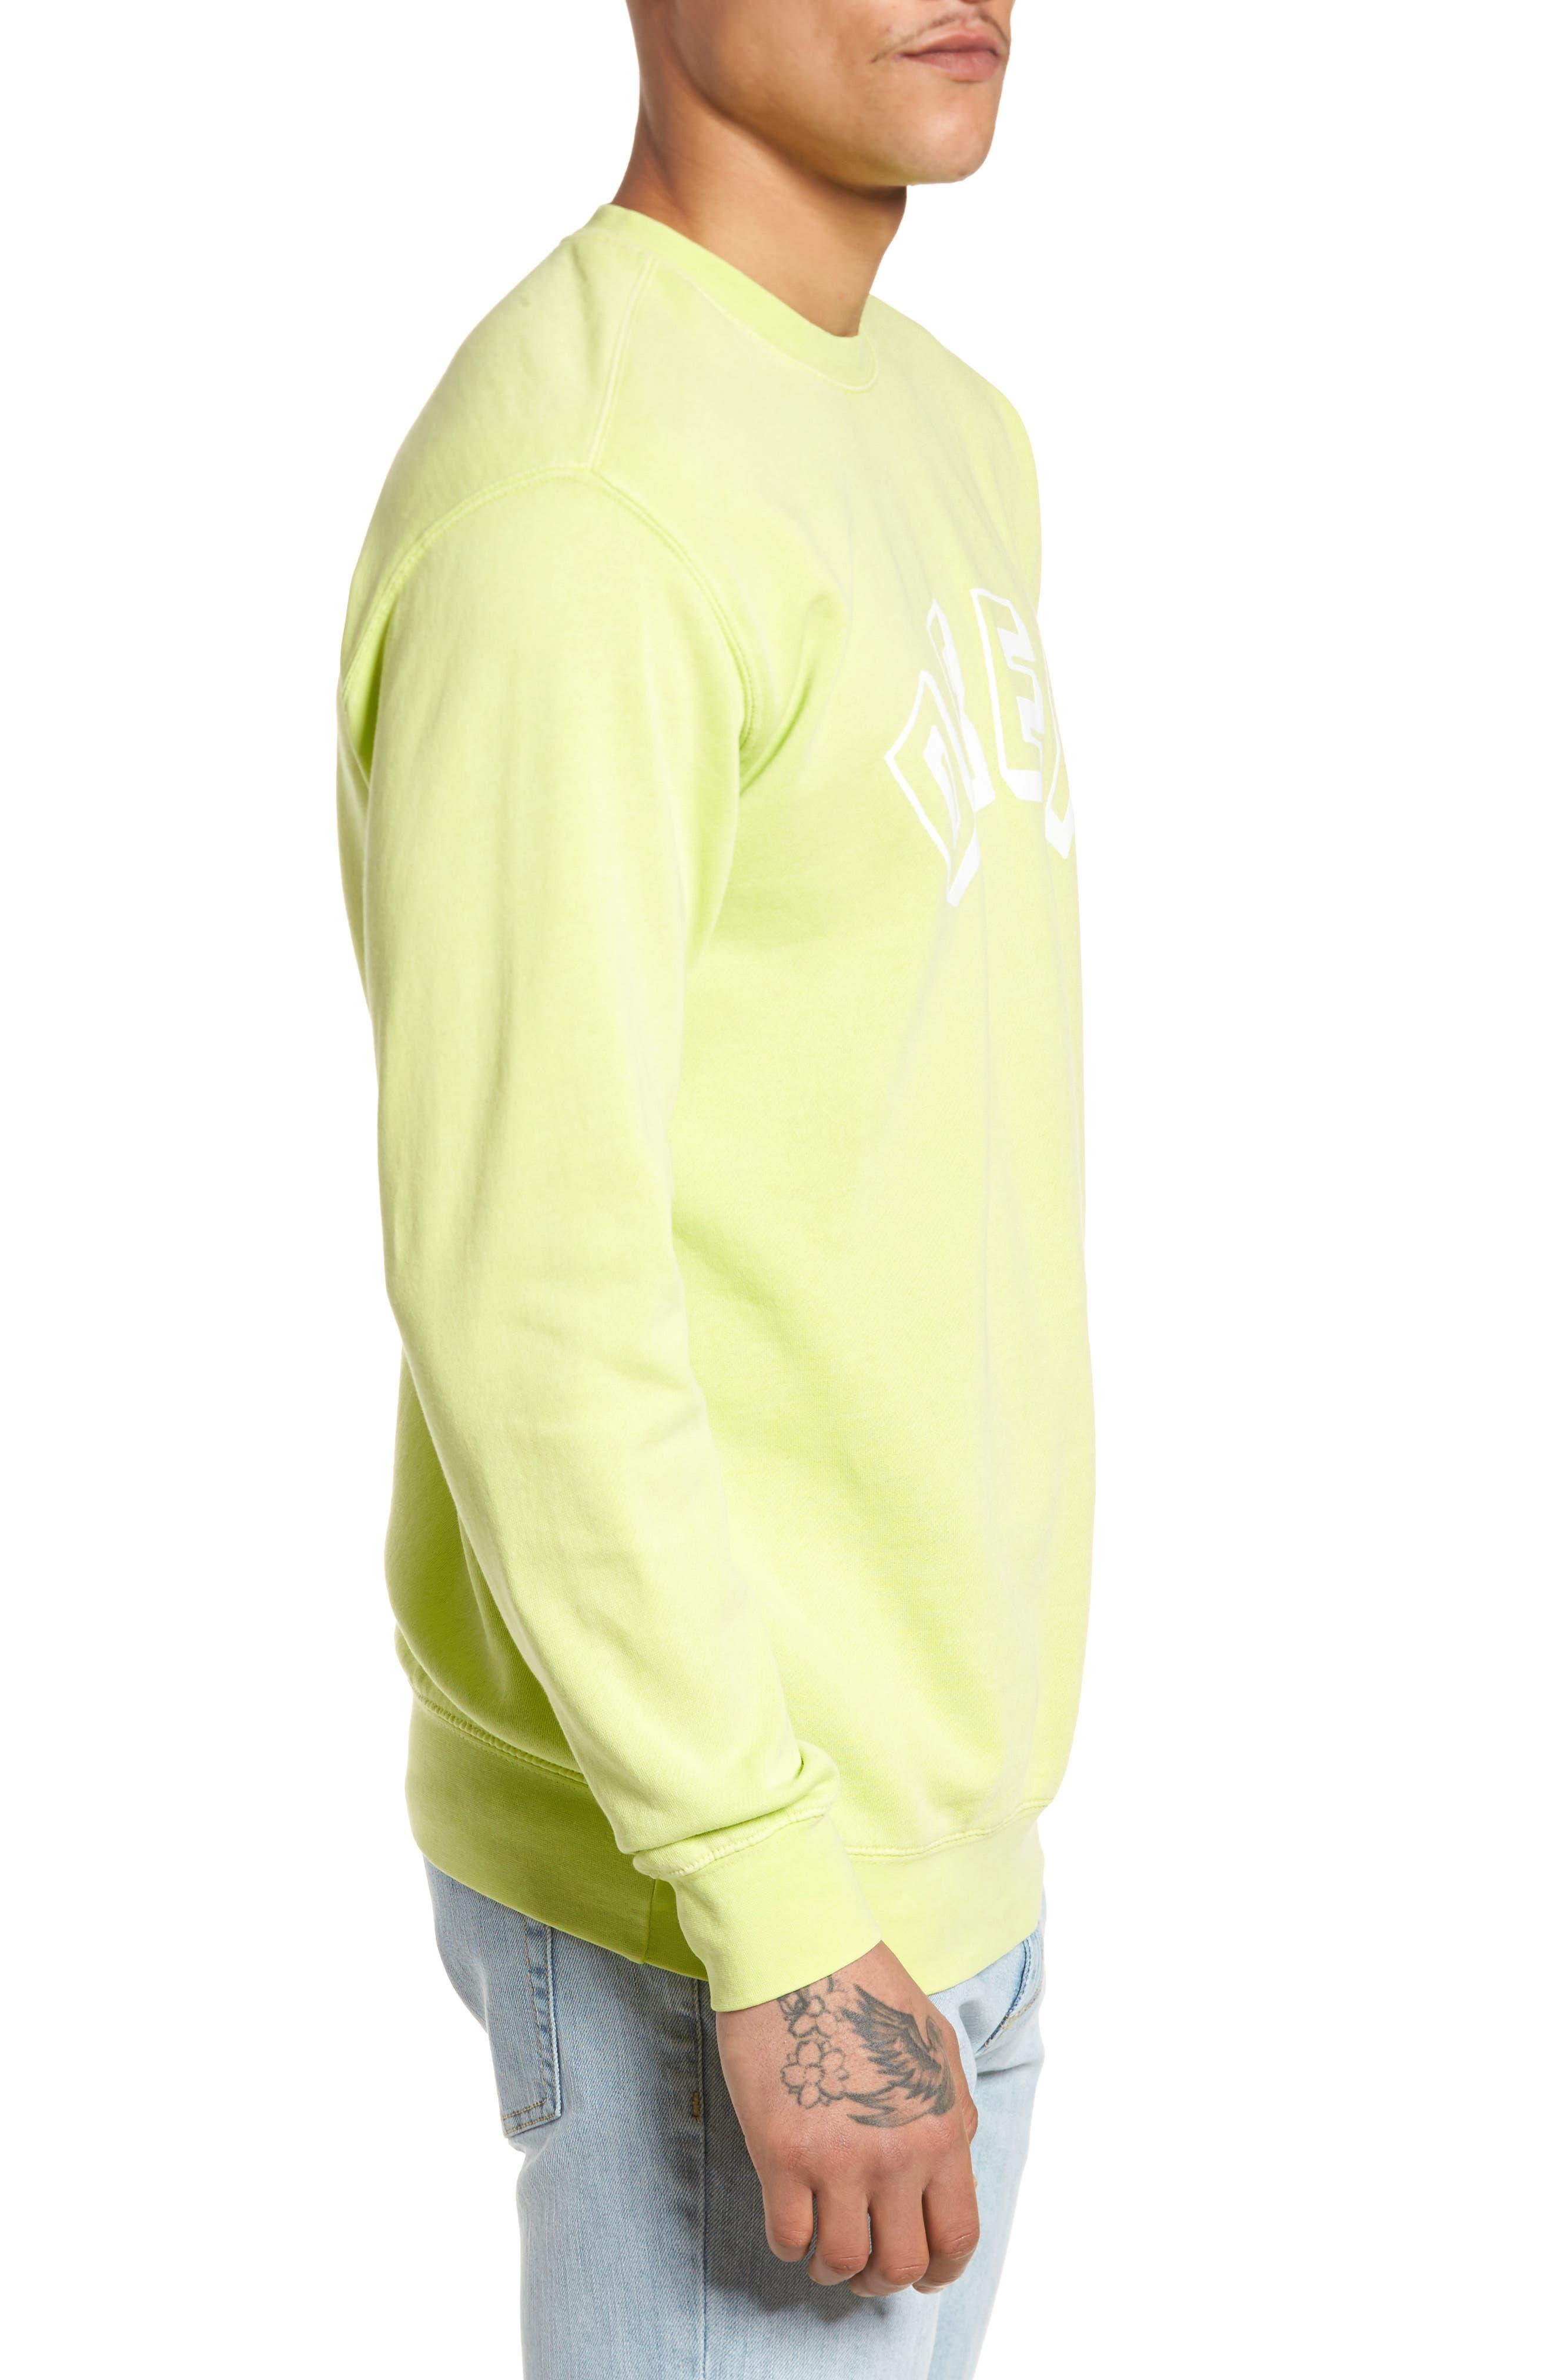 New World Sweatshirt,                             Alternate thumbnail 3, color,                             Dusty Mint